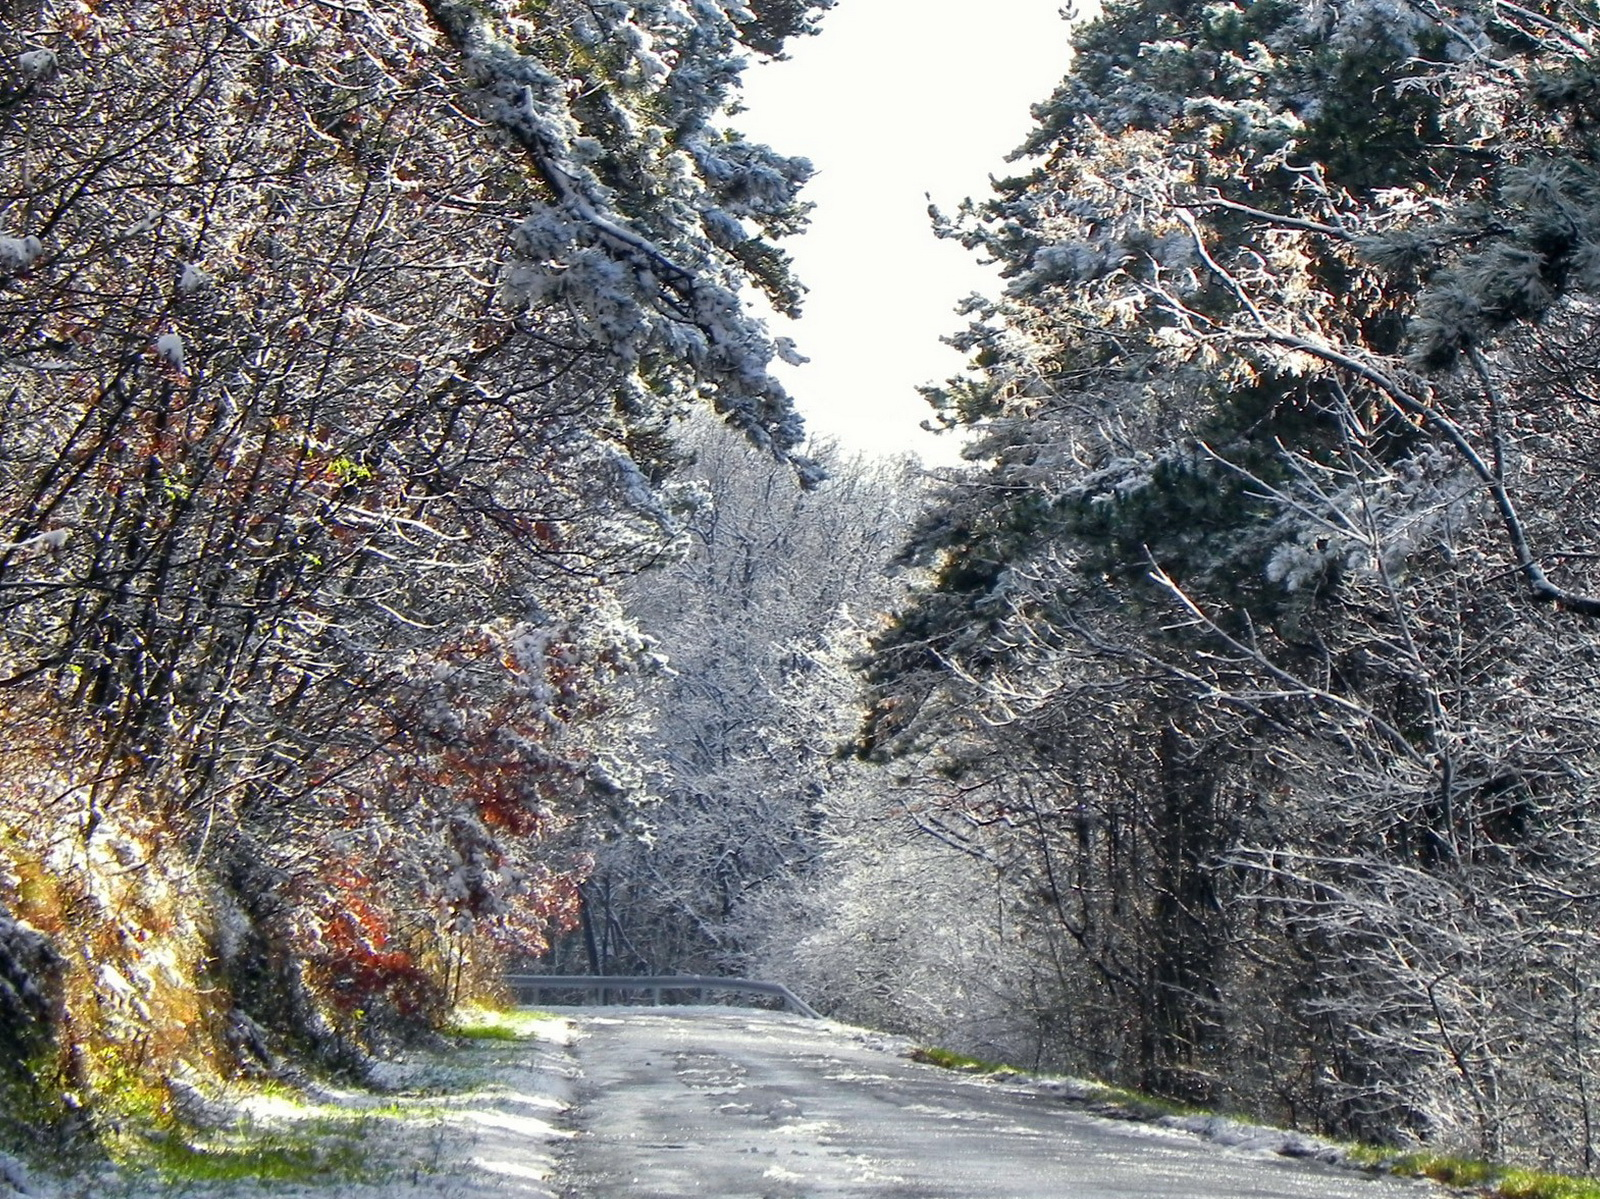 Wallpaper ไหนว่าปีนี้จะหนาวสุดในรอบ 30 ปี 50 Pic 229089-svetik